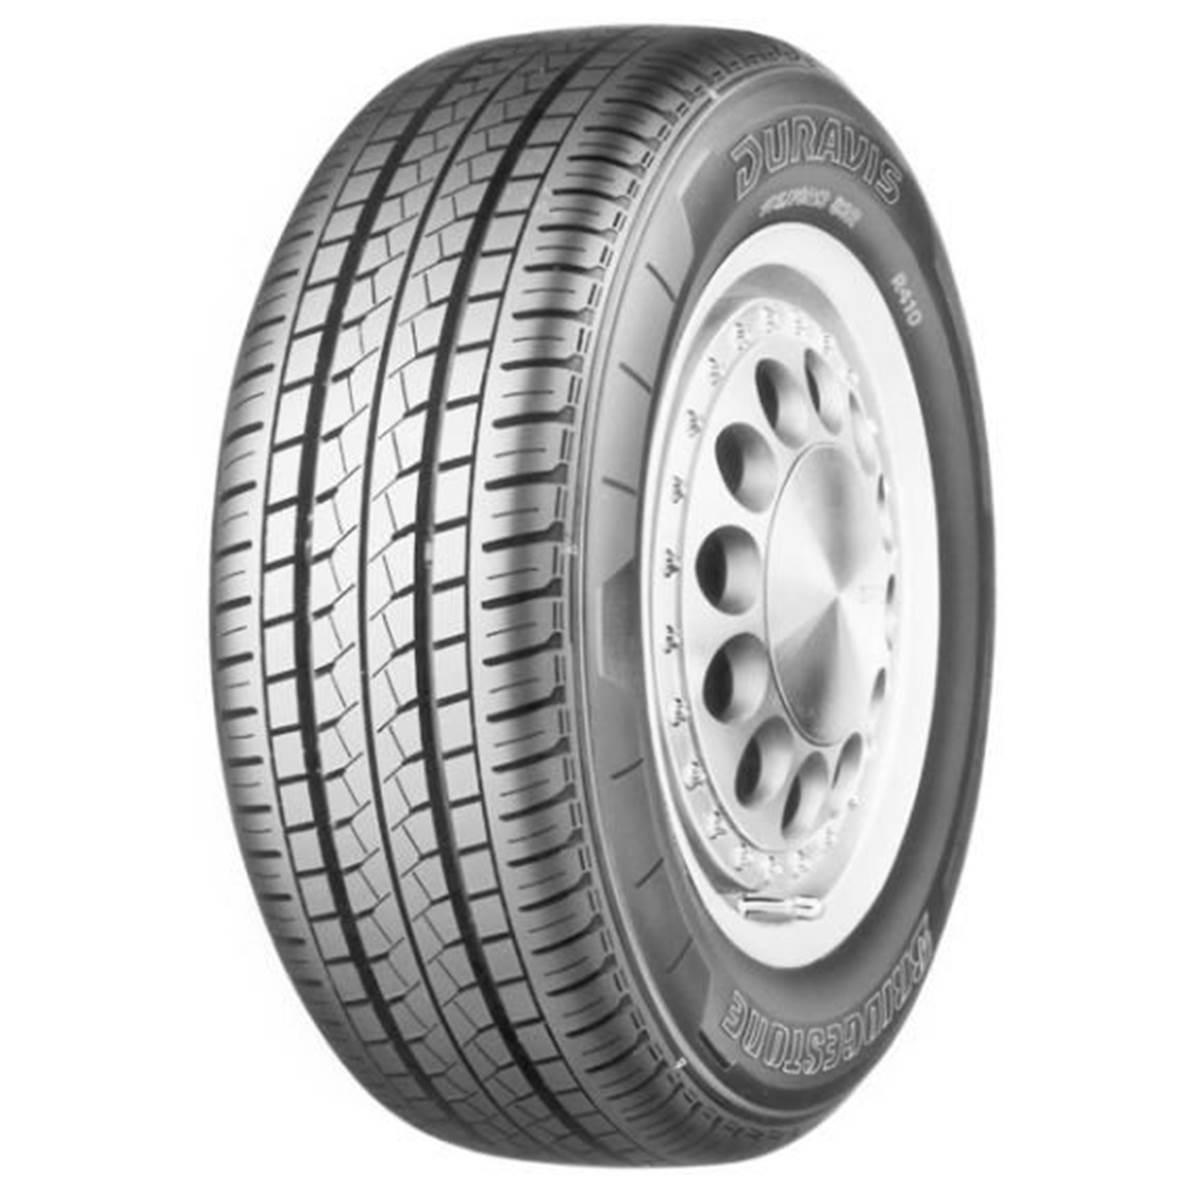 Pneu Camionnette Bridgestone 165/70R14 89R Duravis R410